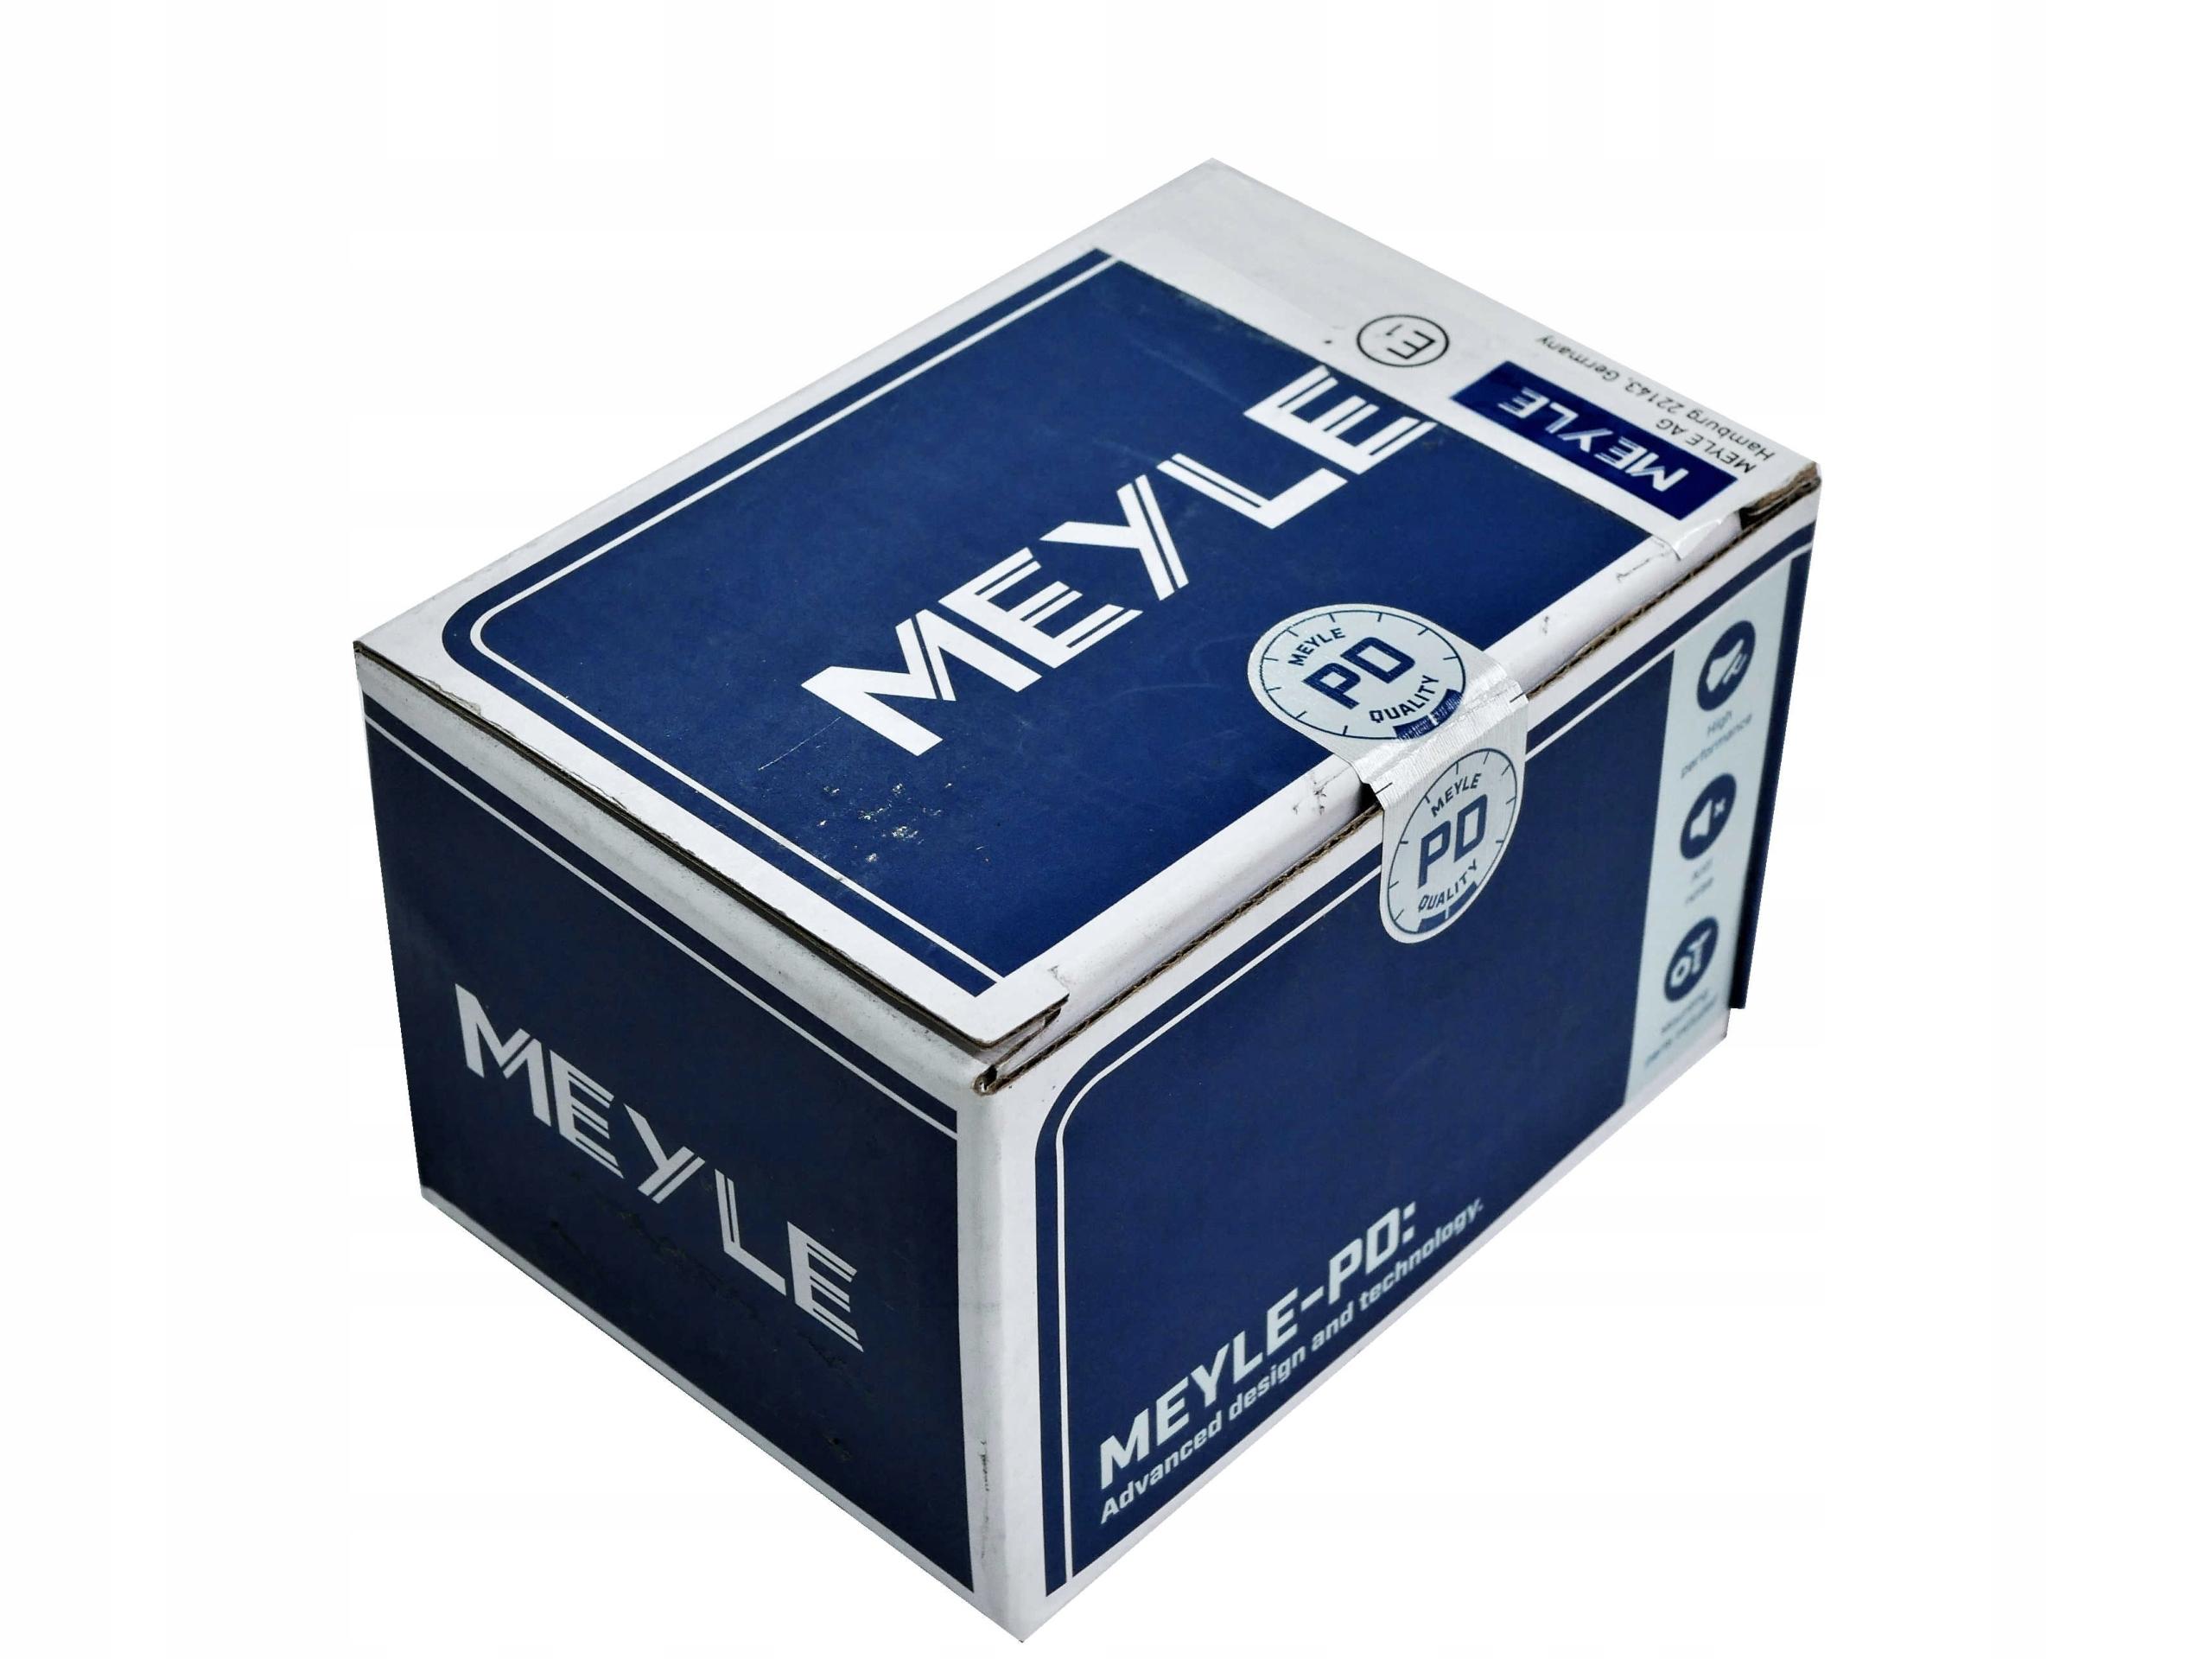 REPAIR KIT wa MEYLE 514 050 0009/HD + FREE OF CHARGE